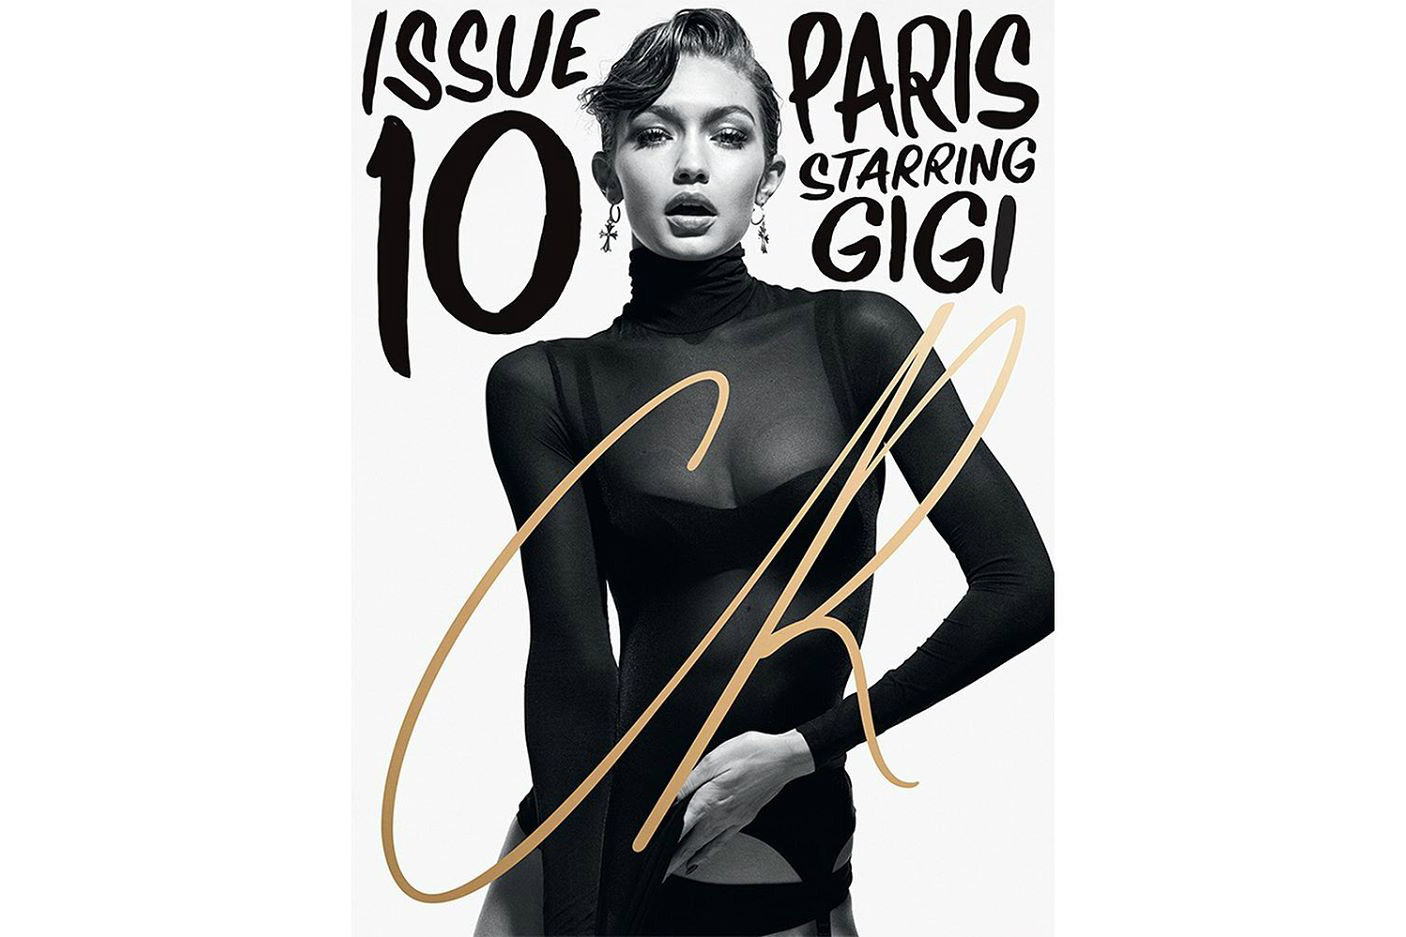 Gigi Bella Hadid CR Fashion Book Issue 10 Covers